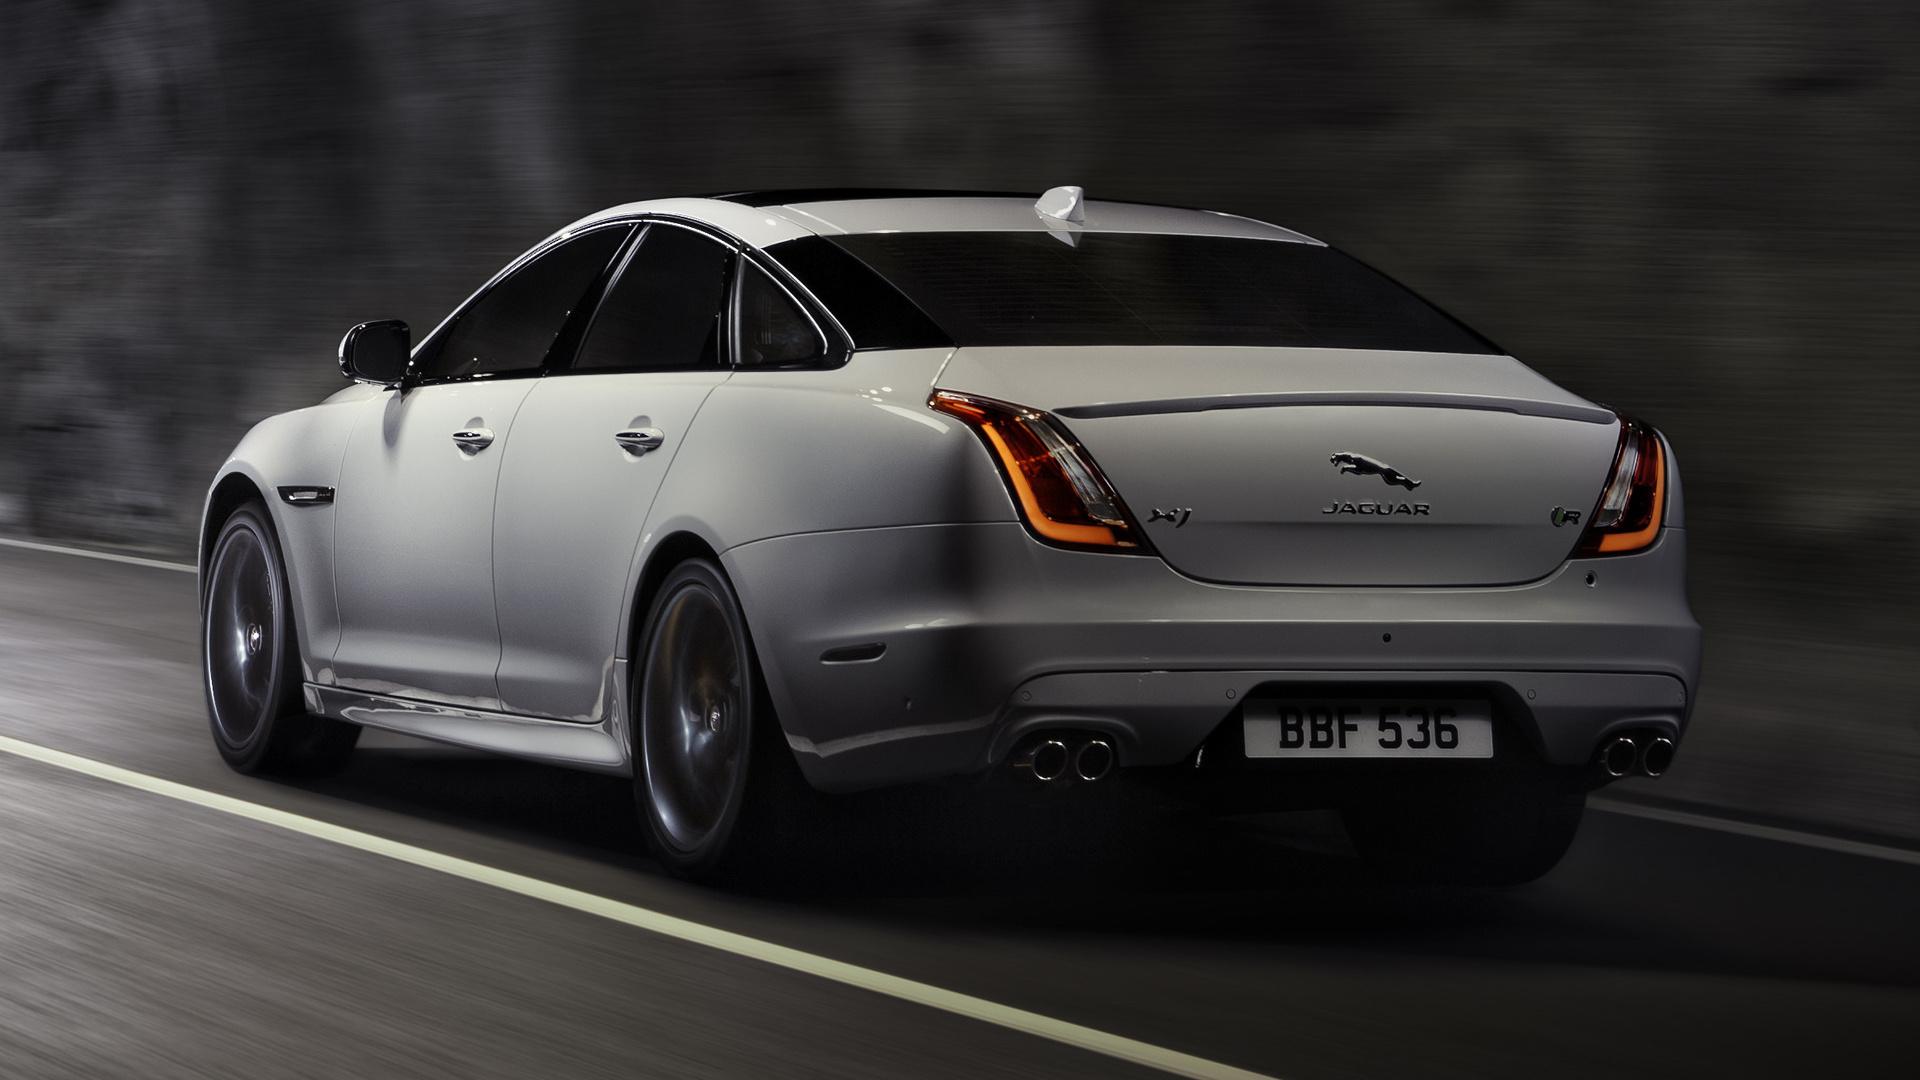 2015 Jaguar XJR (UK) - Wallpapers and HD Images | Car Pixel